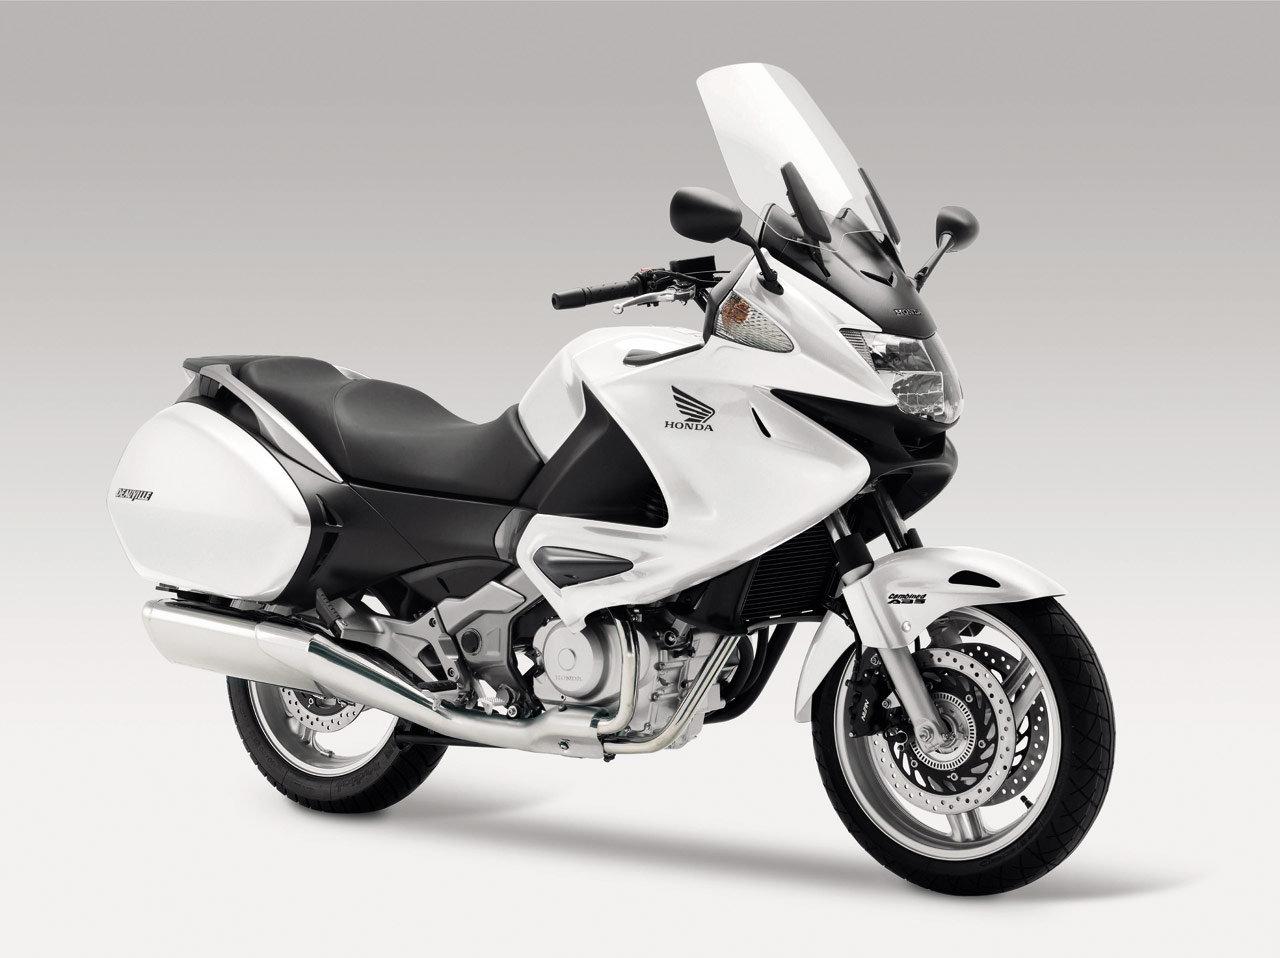 Listino Honda CB 650 F Naked Media - image 14683_honda-deauvilleabs on http://moto.motori.net